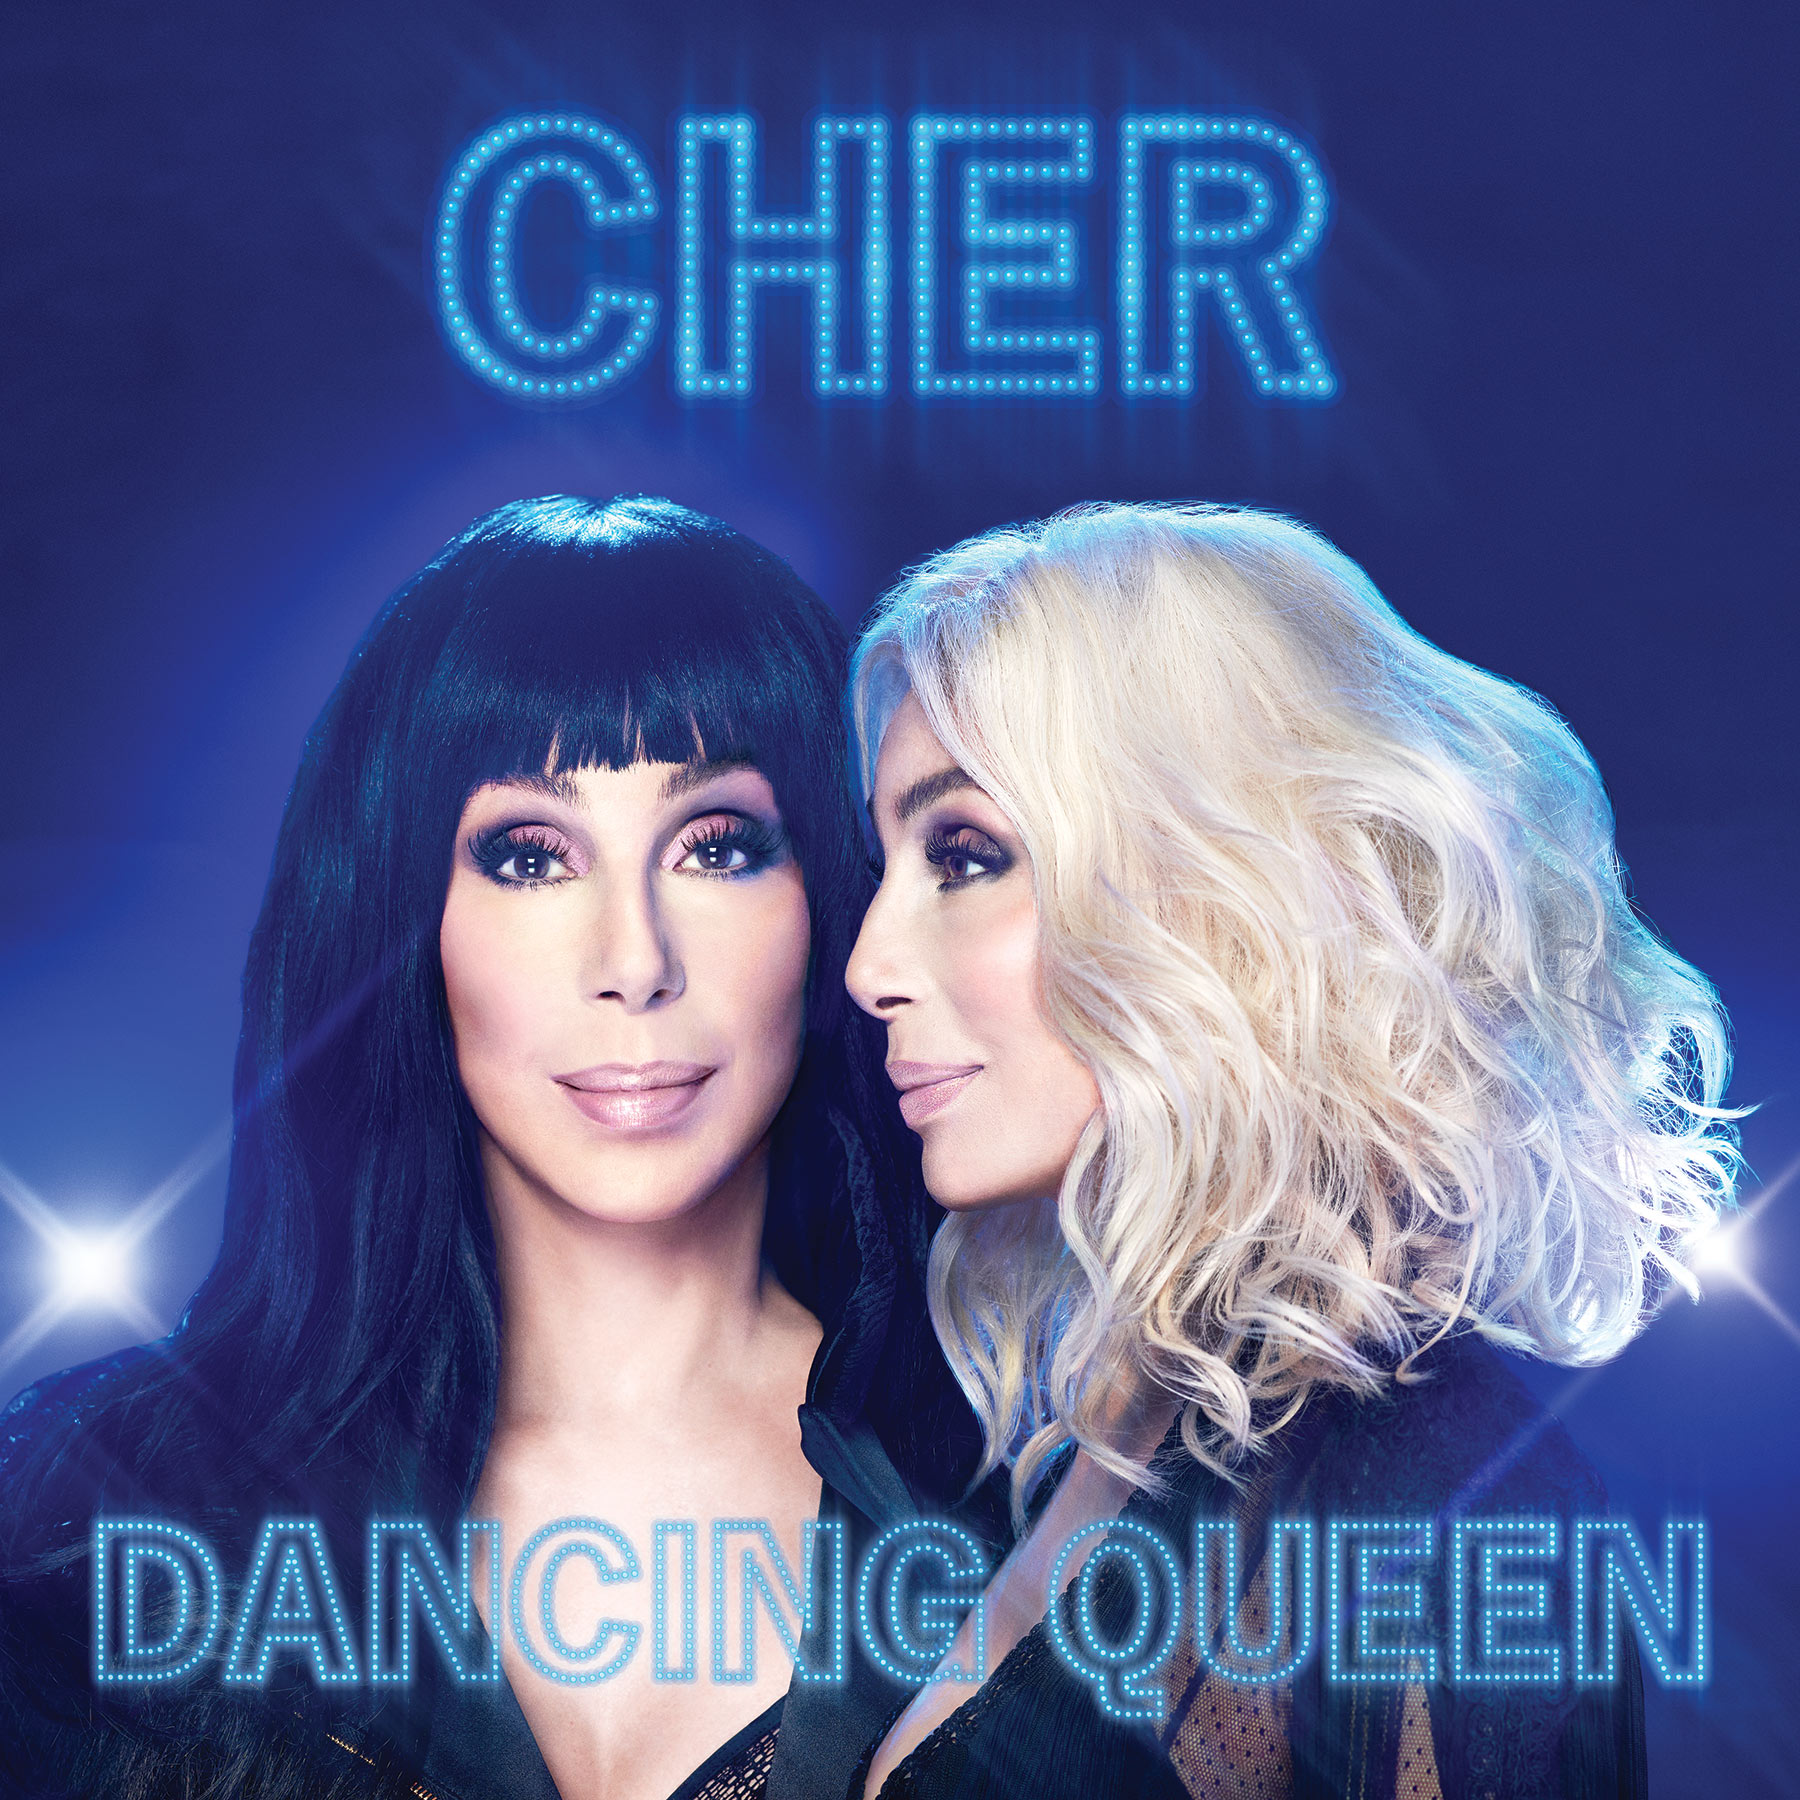 dancing-queen-album-cover-tiff-1